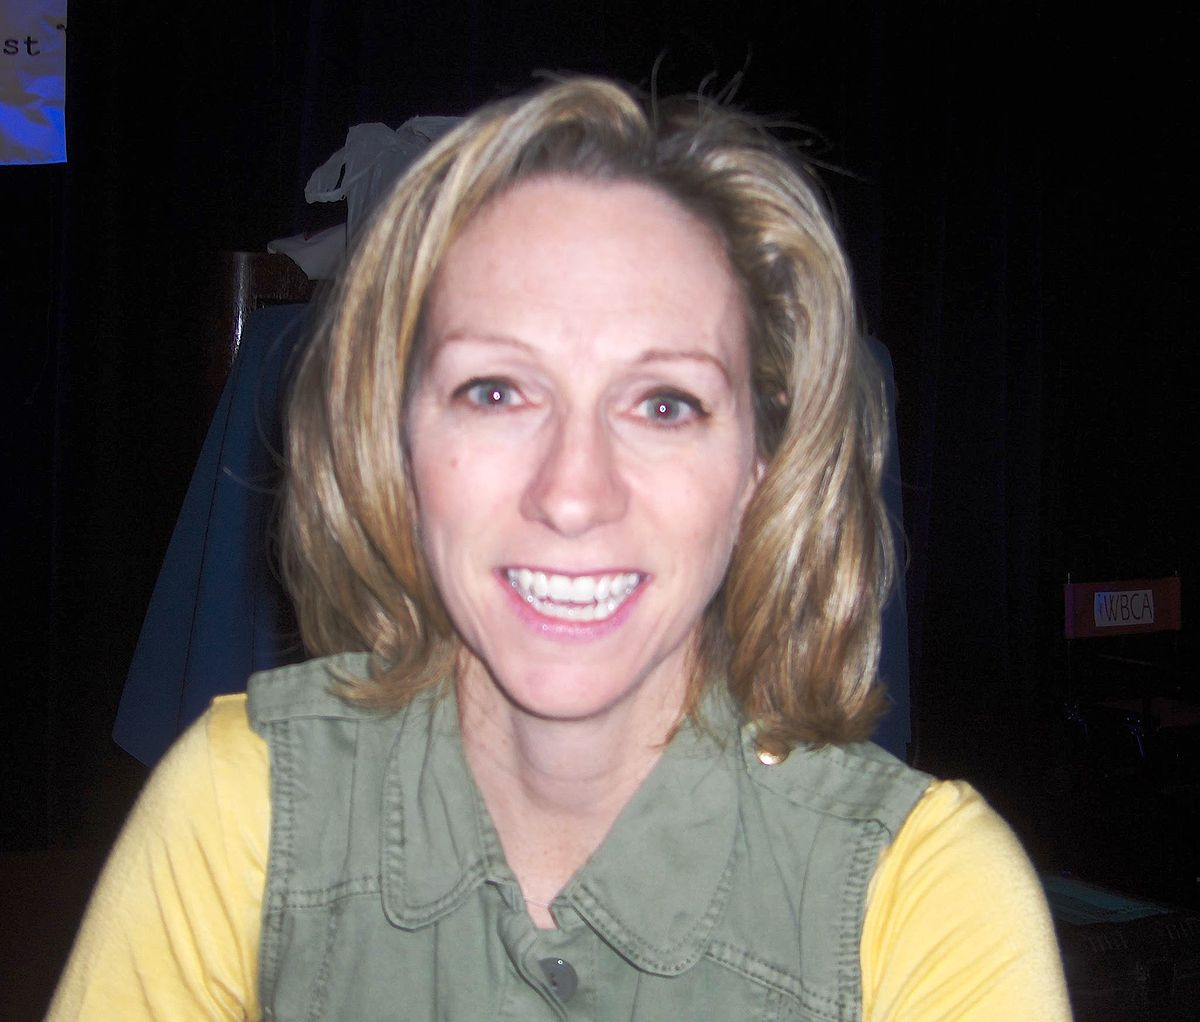 Beth Mowins Wikipedia